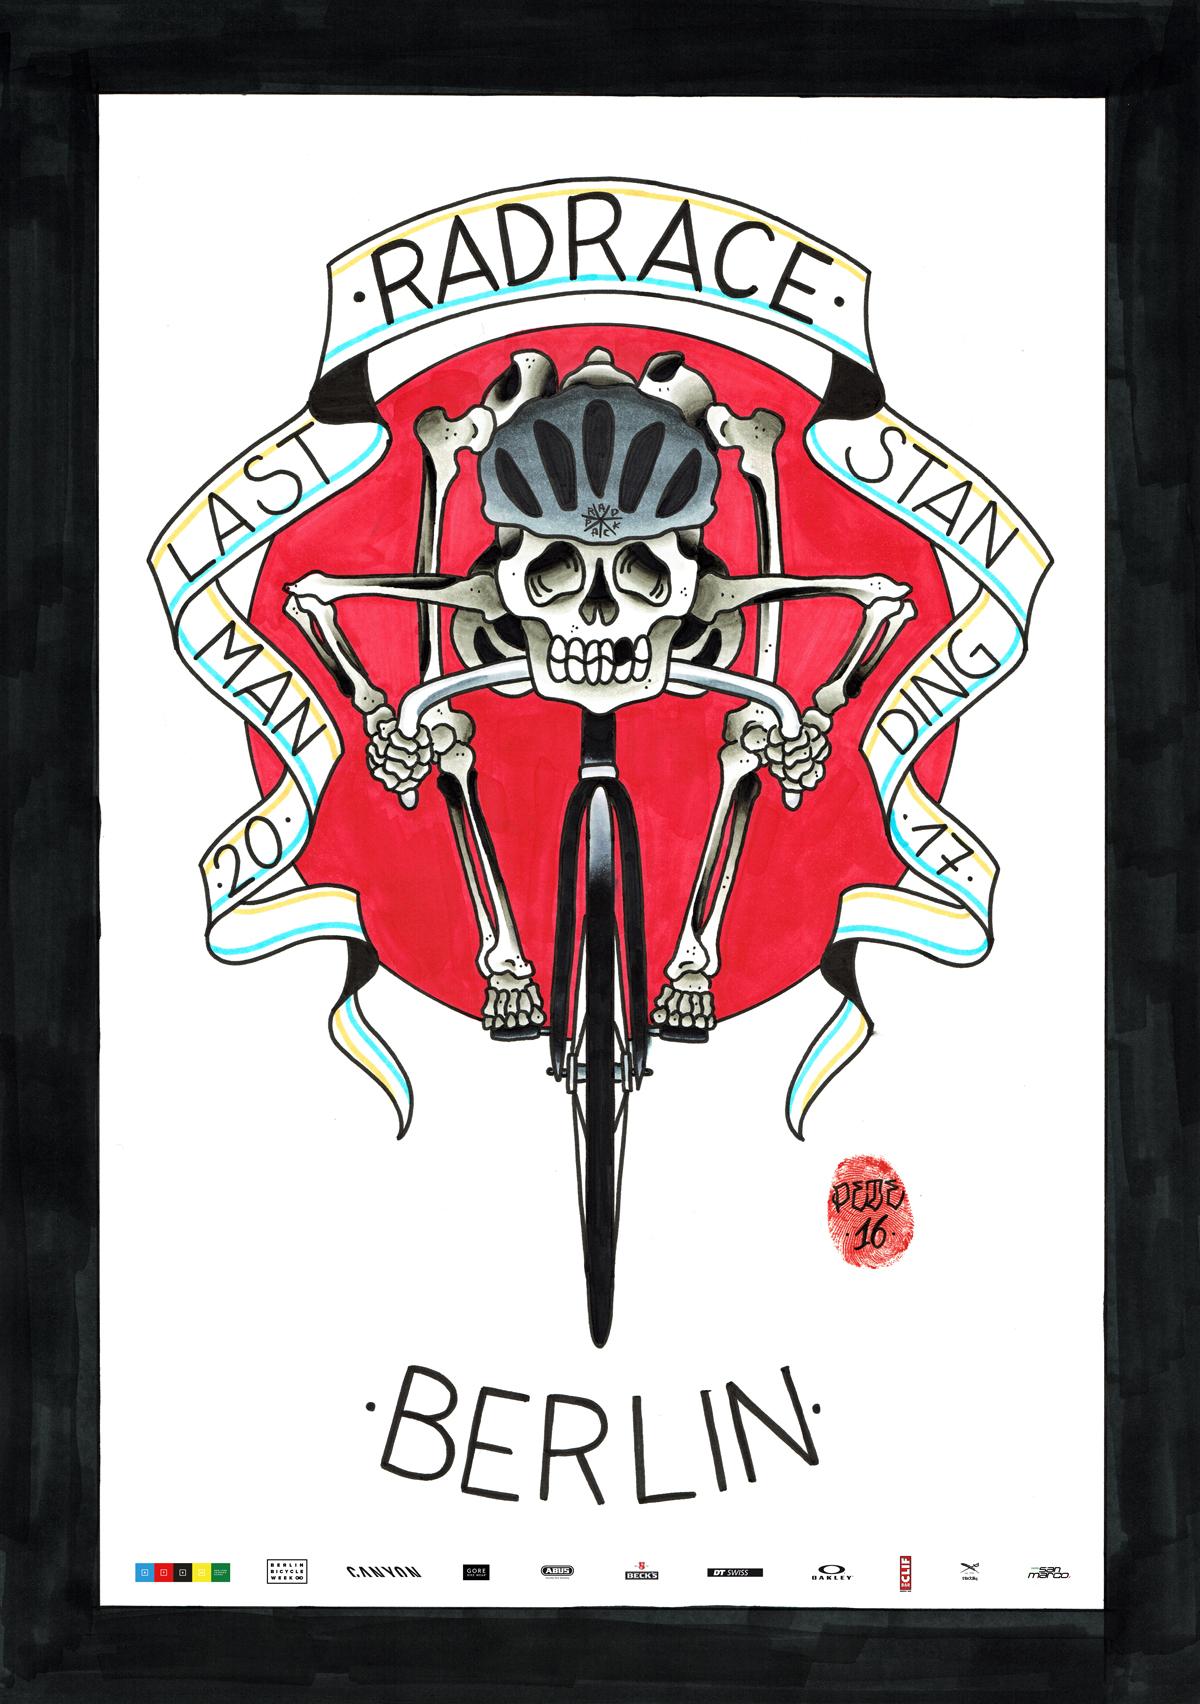 The official event poster // RAD RACE LAST MAN STANDING berliner fahrradschau 2017